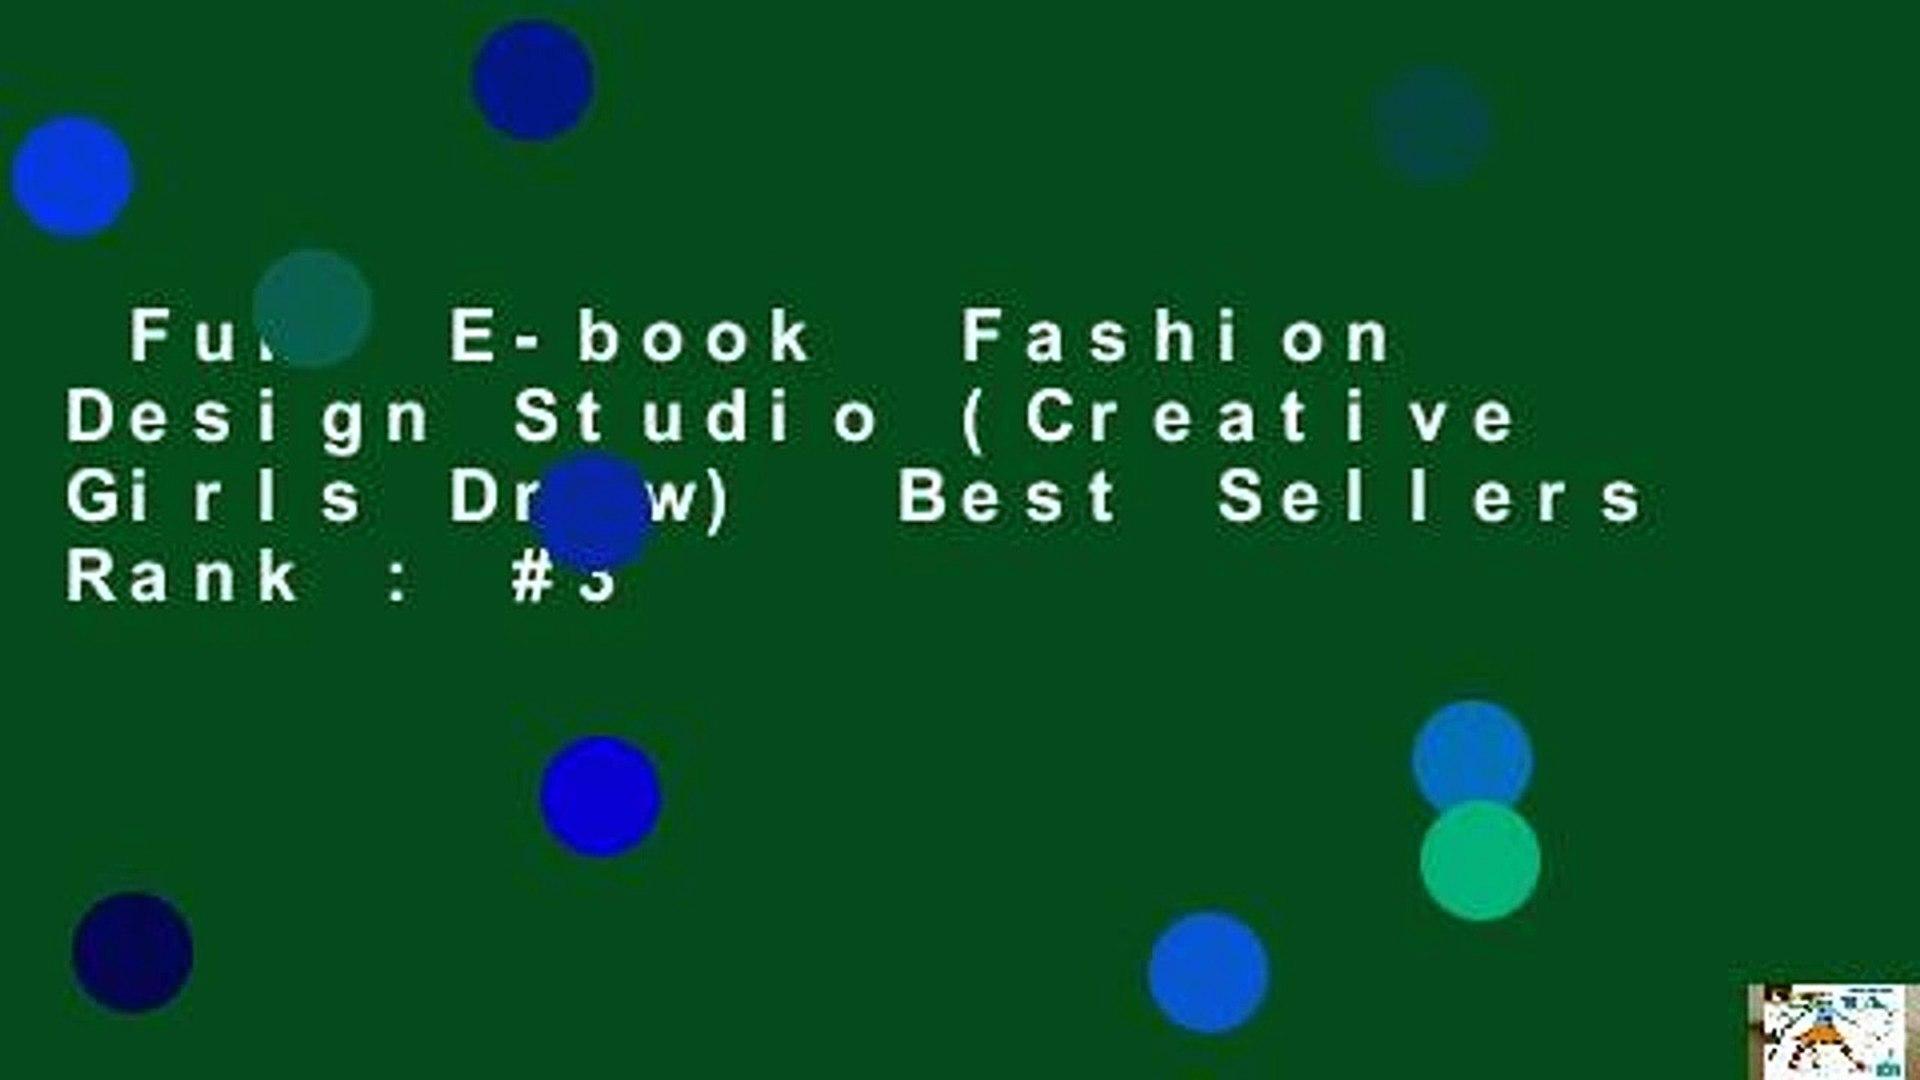 Full E Book Fashion Design Studio Creative Girls Draw Best Sellers Rank 3 Video Dailymotion